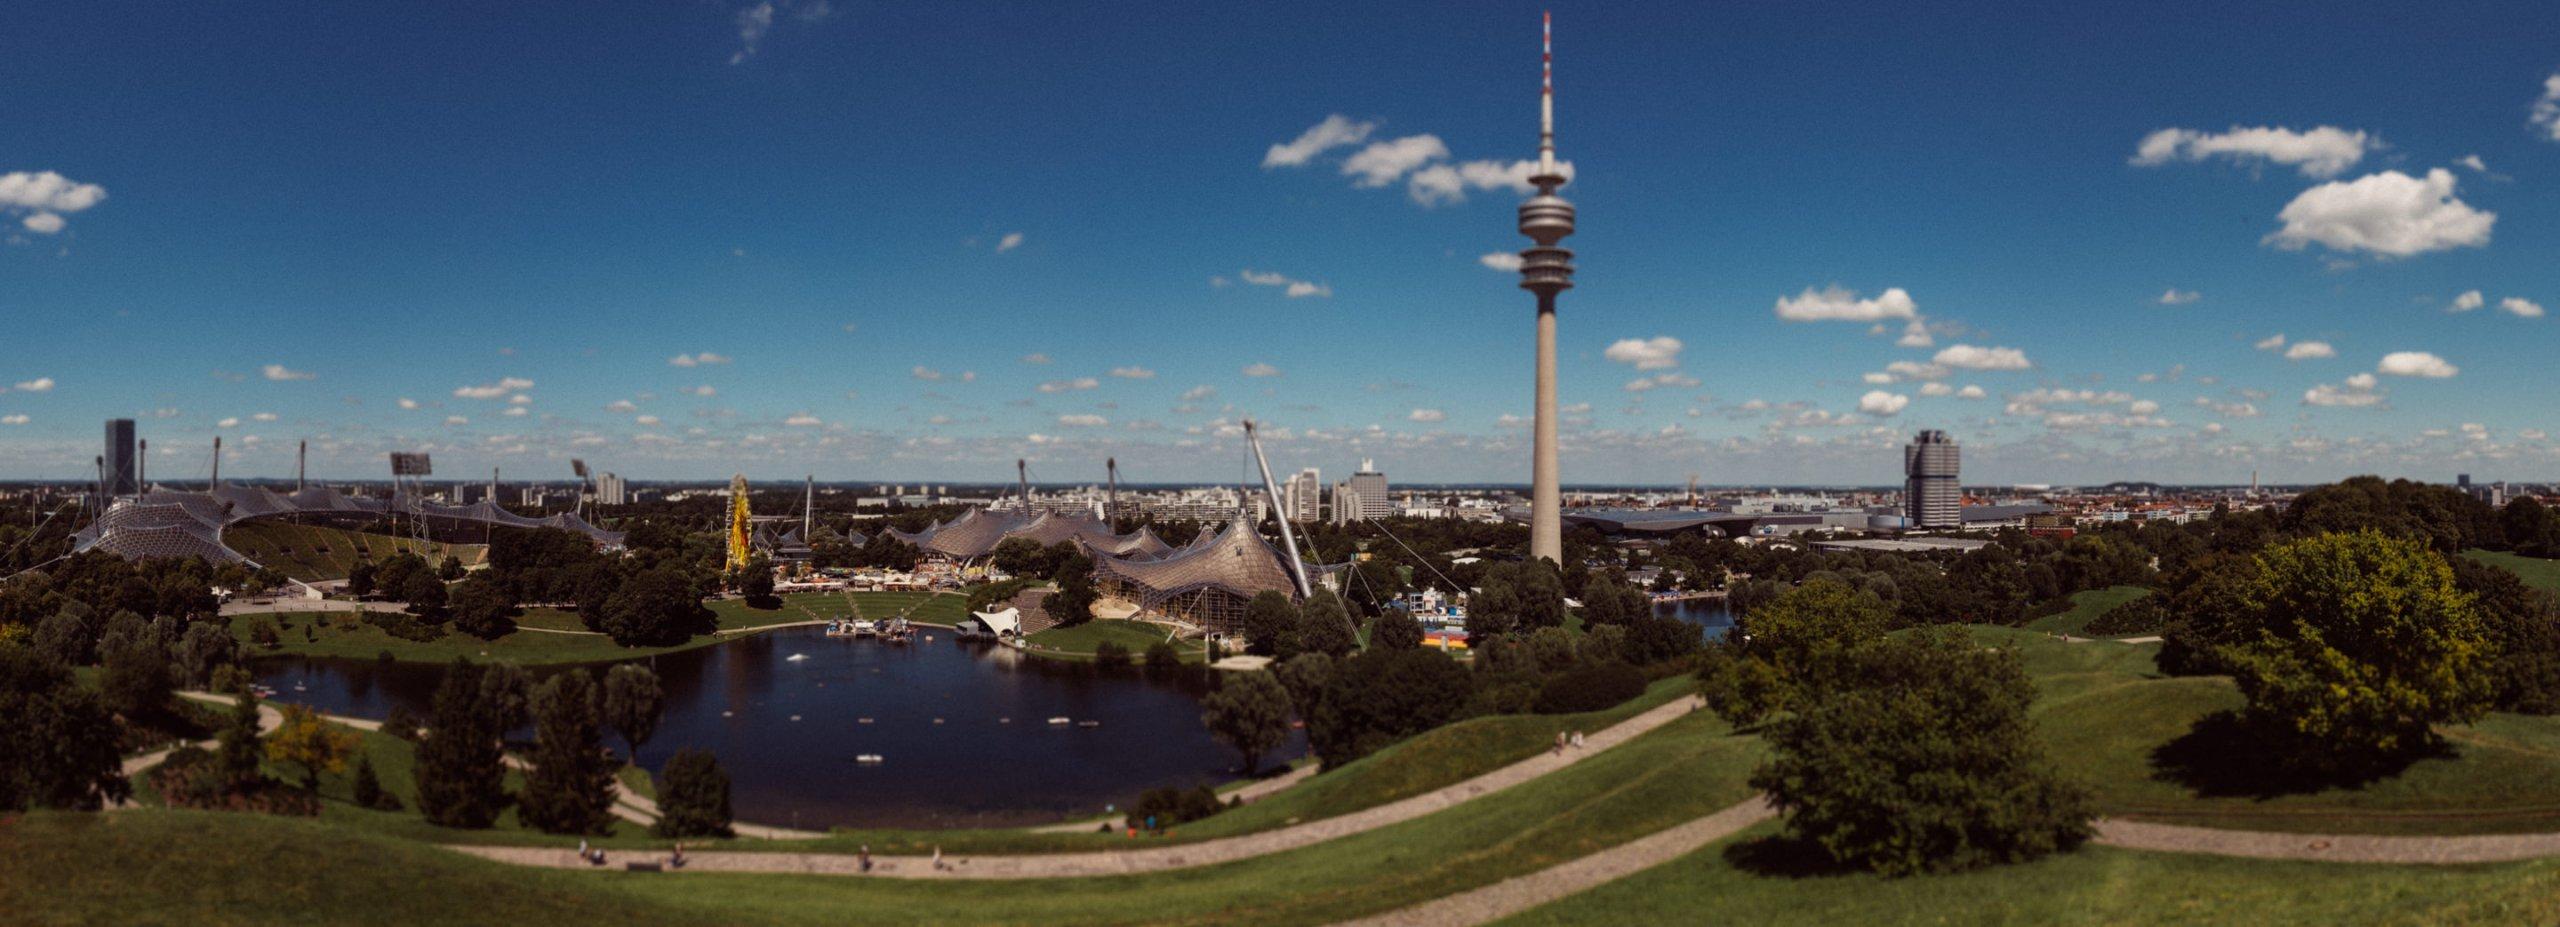 Johannes-Maur-Panorama-Fotografie-Munich_2